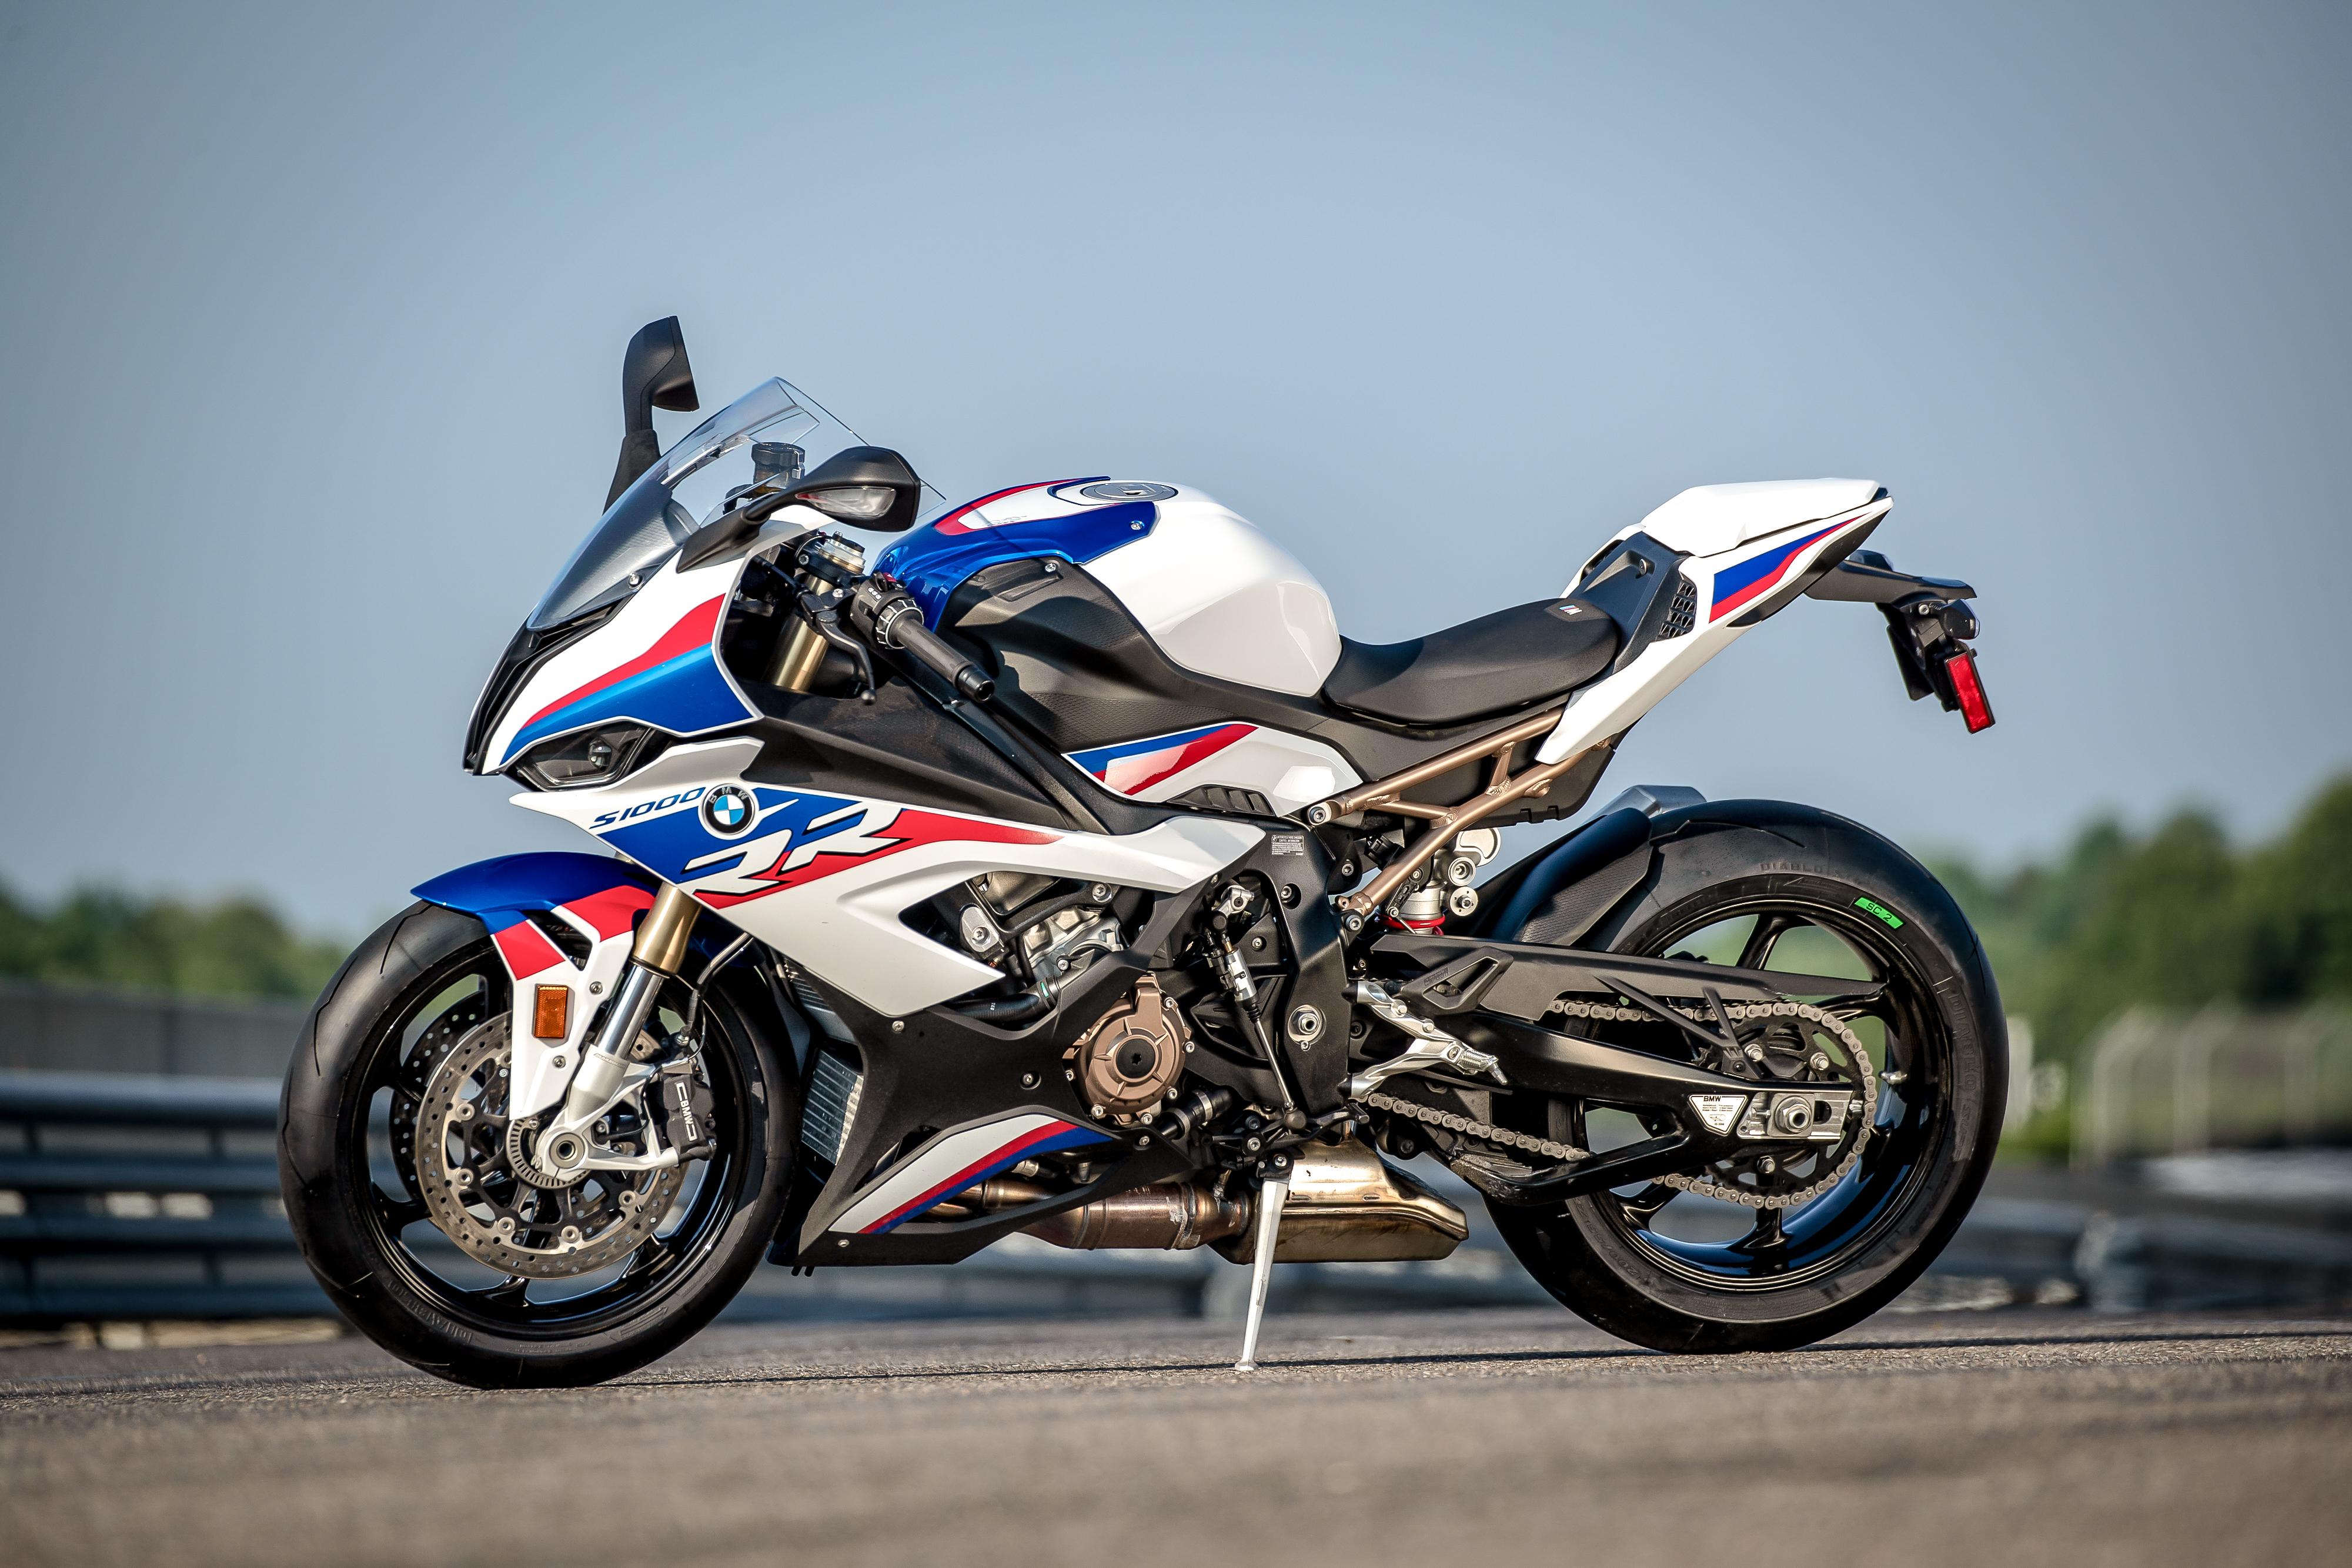 Miraculous 2020 Bmw S 1000 Rr First Ride Review Revzilla Frankydiablos Diy Chair Ideas Frankydiabloscom